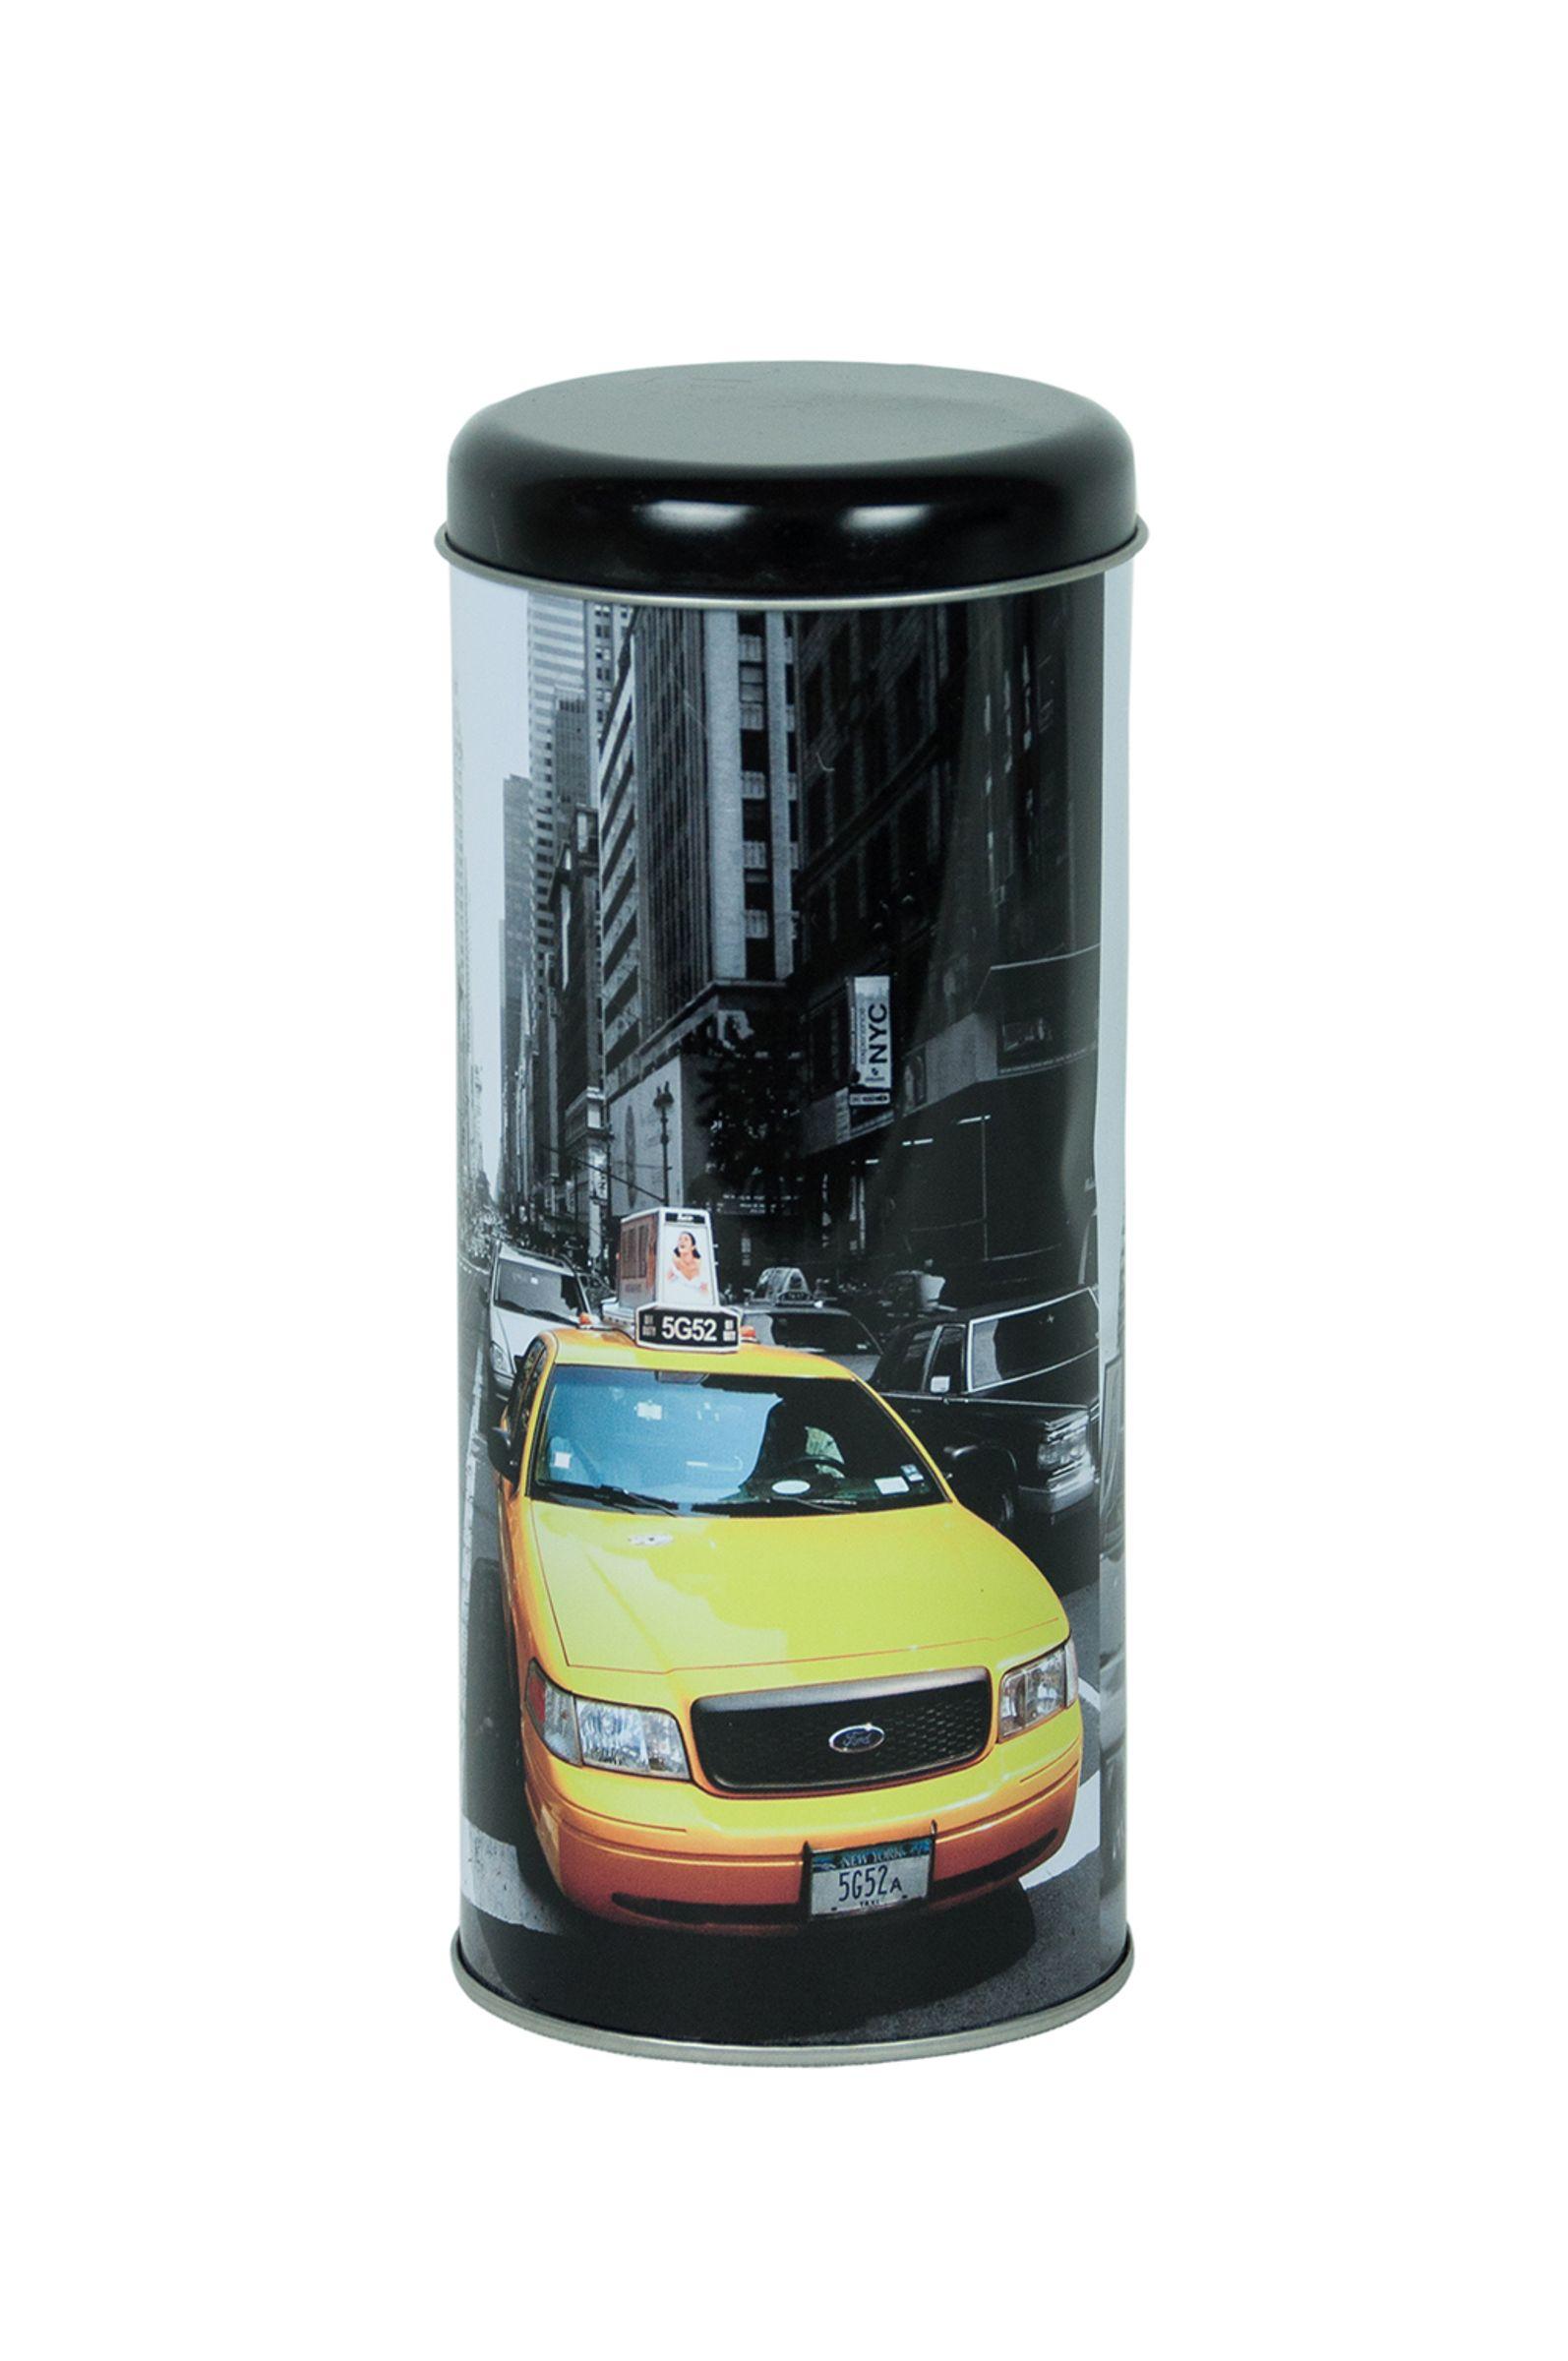 Kaffeepaddose Kaffeepad Dose Vorratsdose Kaffee Pulver Bohnen mit New York Motiv